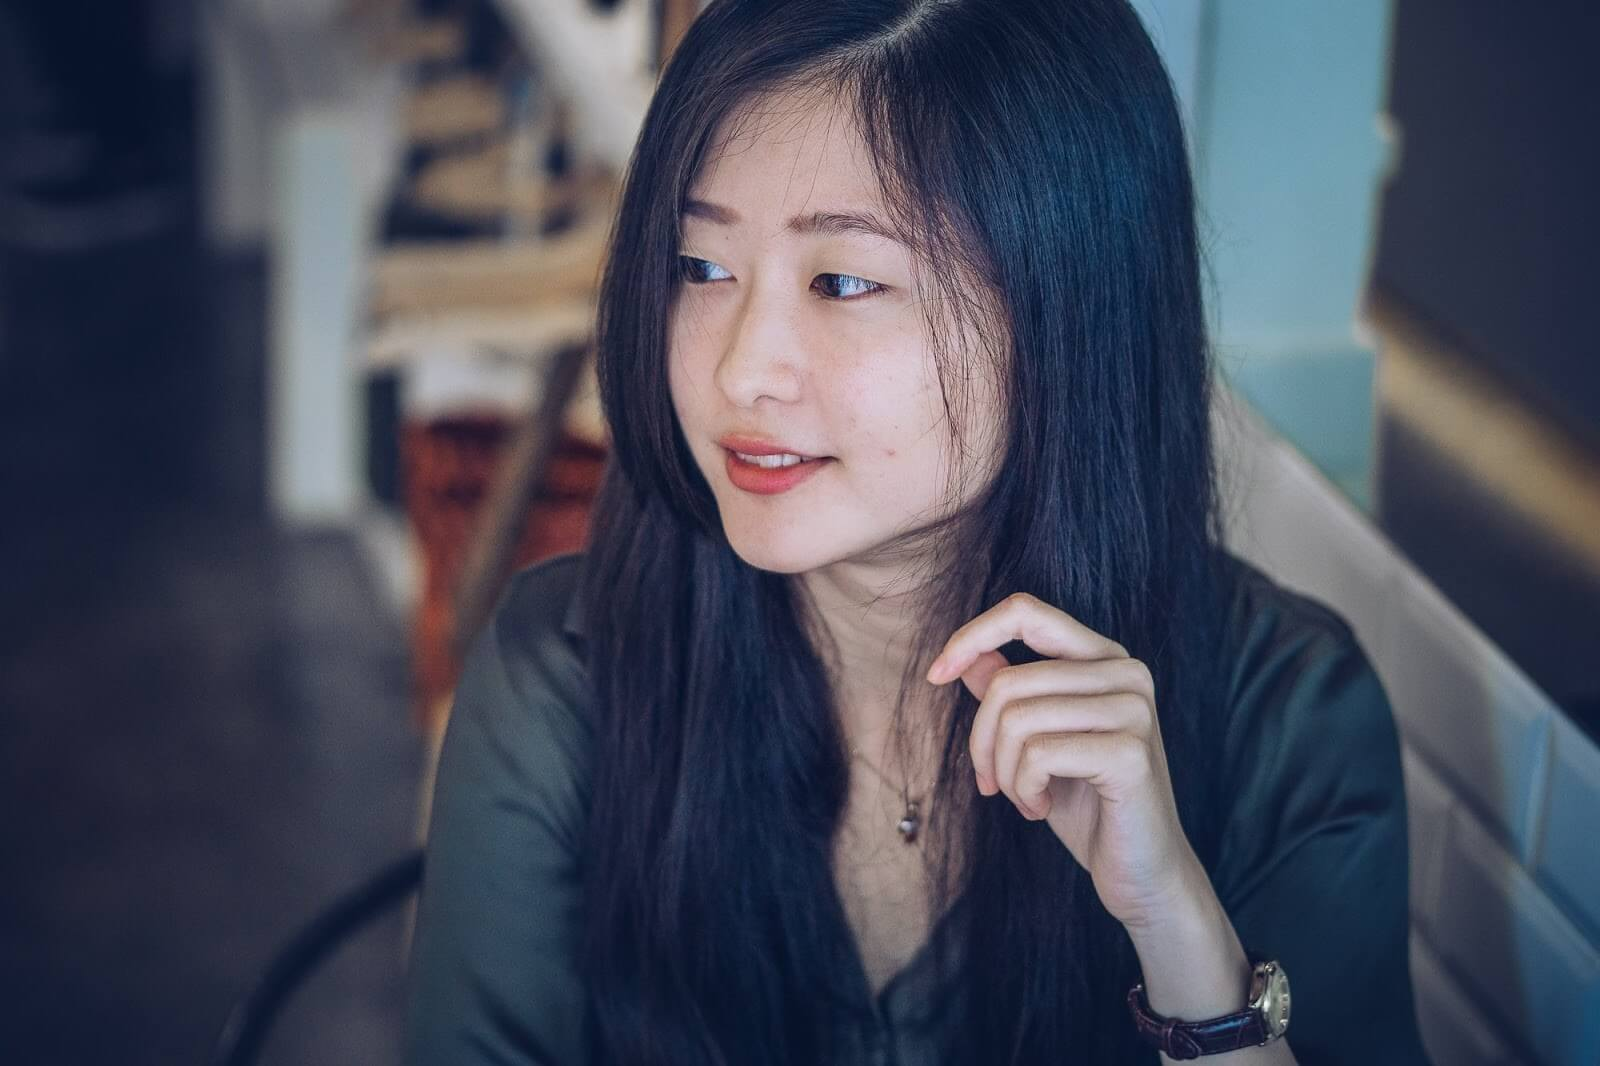 Vloggger Akari Nakatani